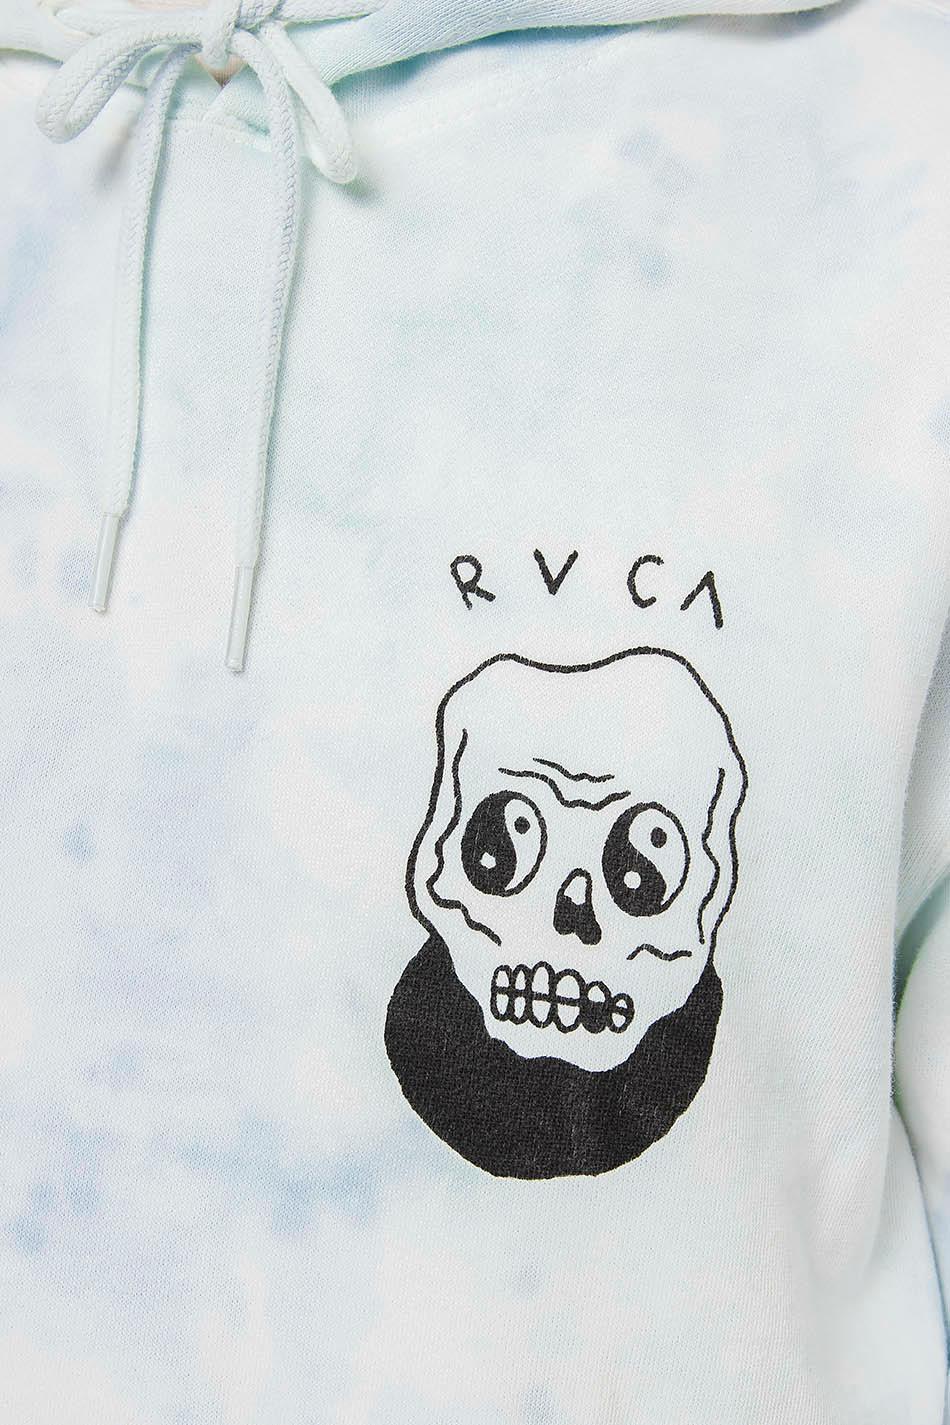 RVCA Benji Skull Blumble Tie Dye Hoodie